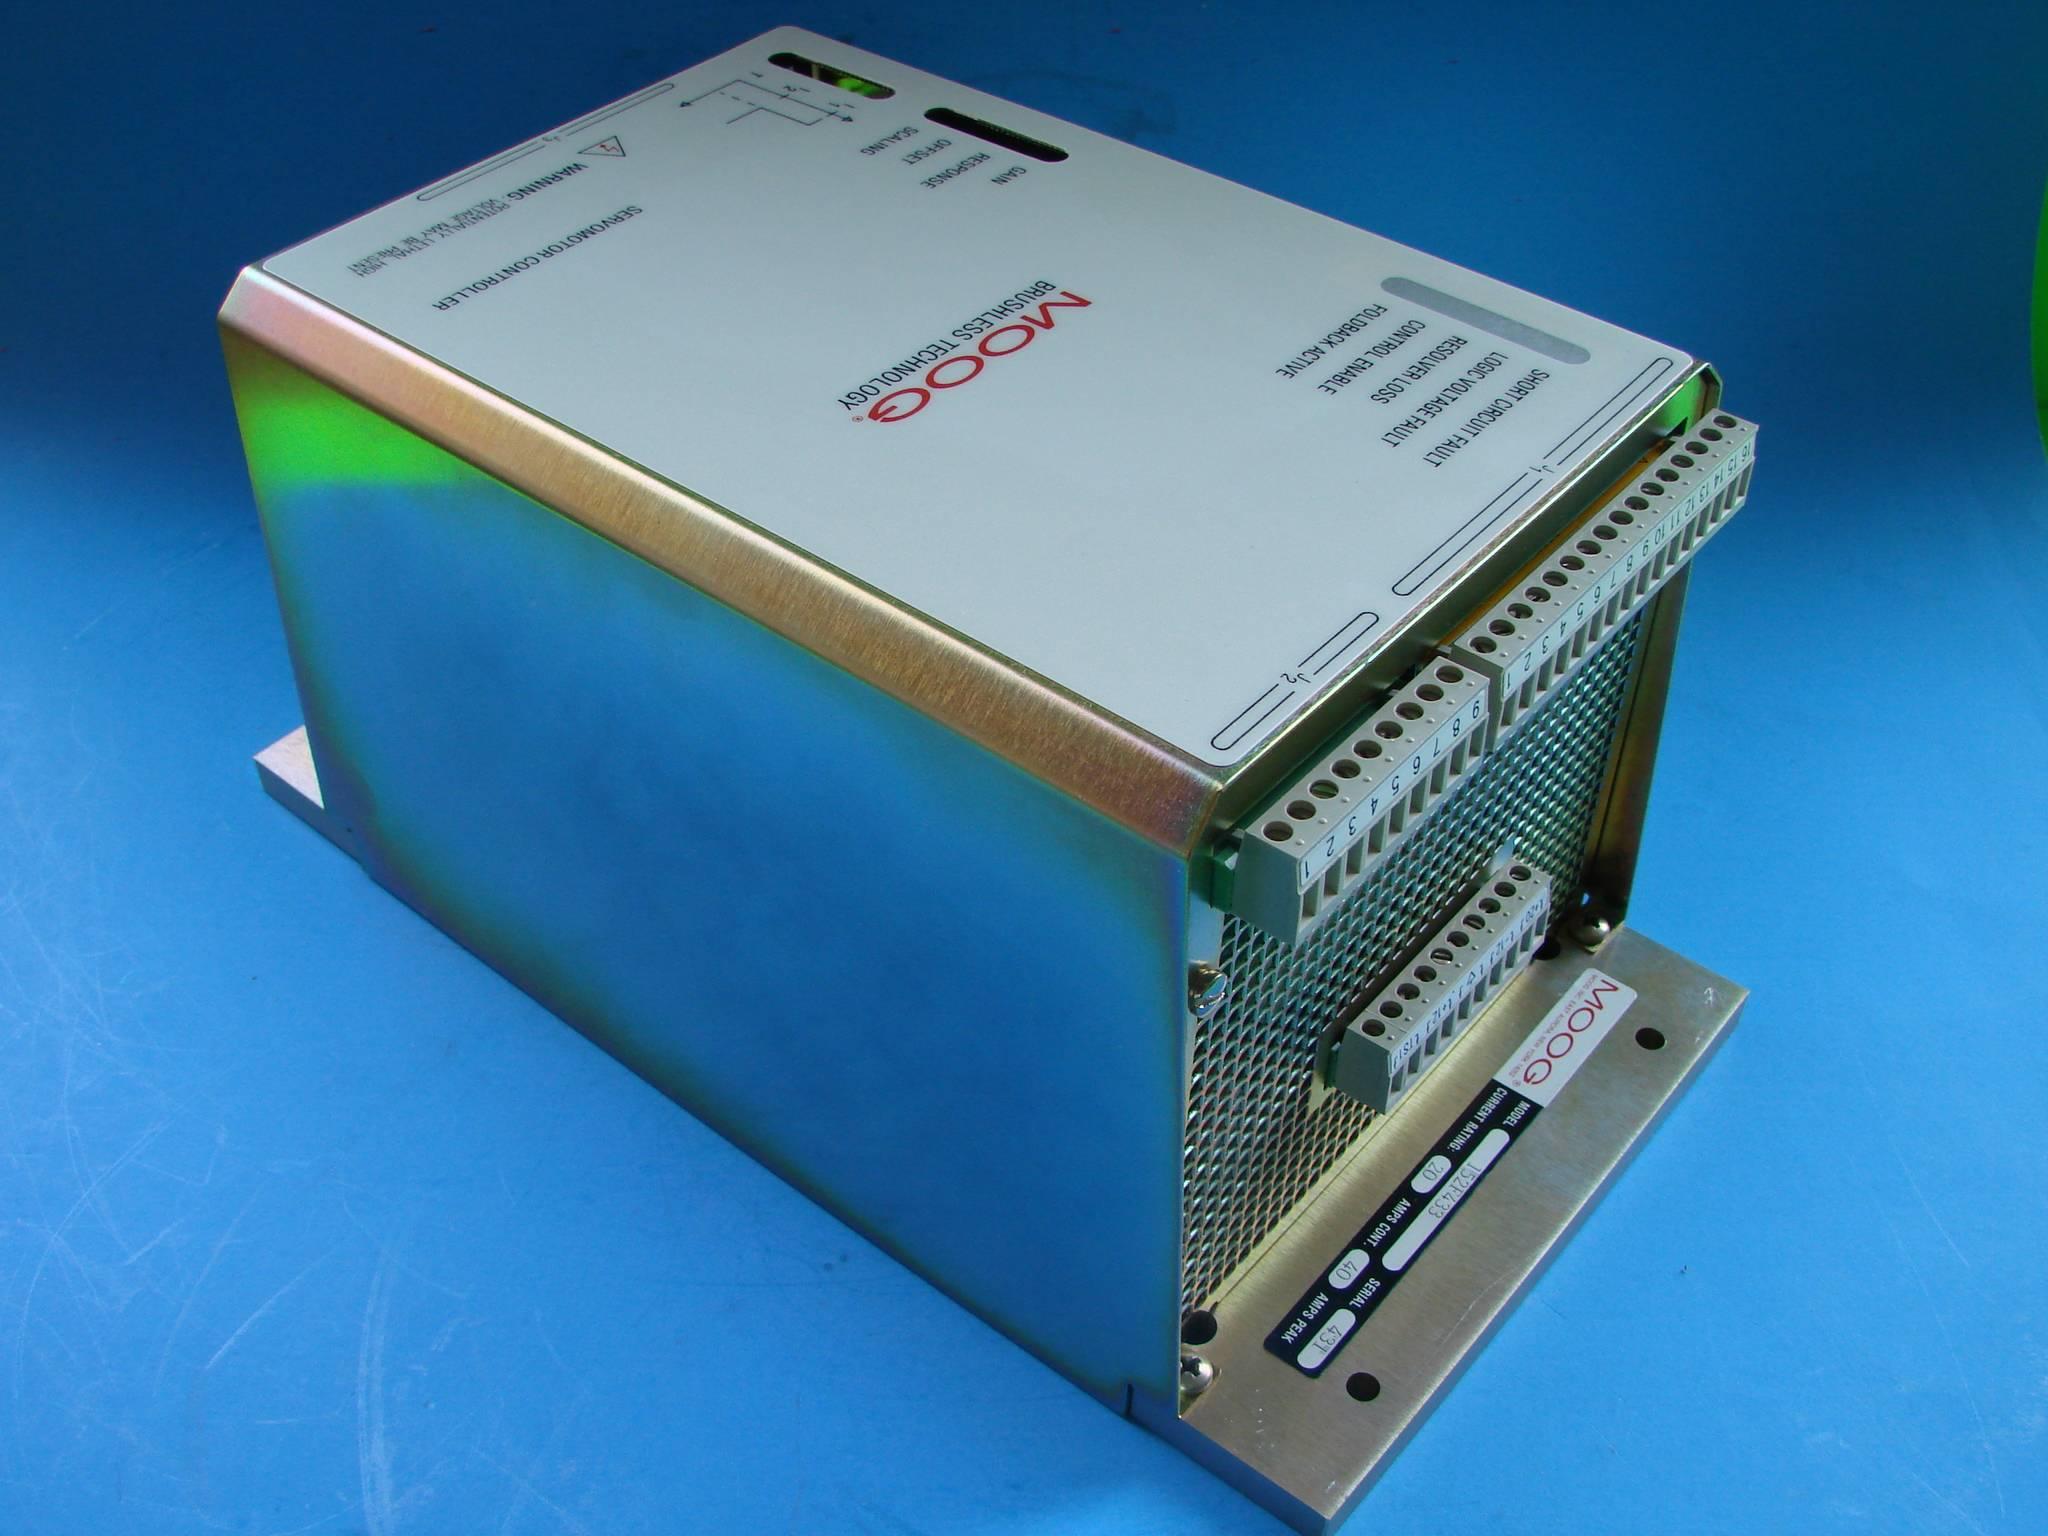 Moog servo motor controller 152 f 433 new 10449 for Servo motor with controller